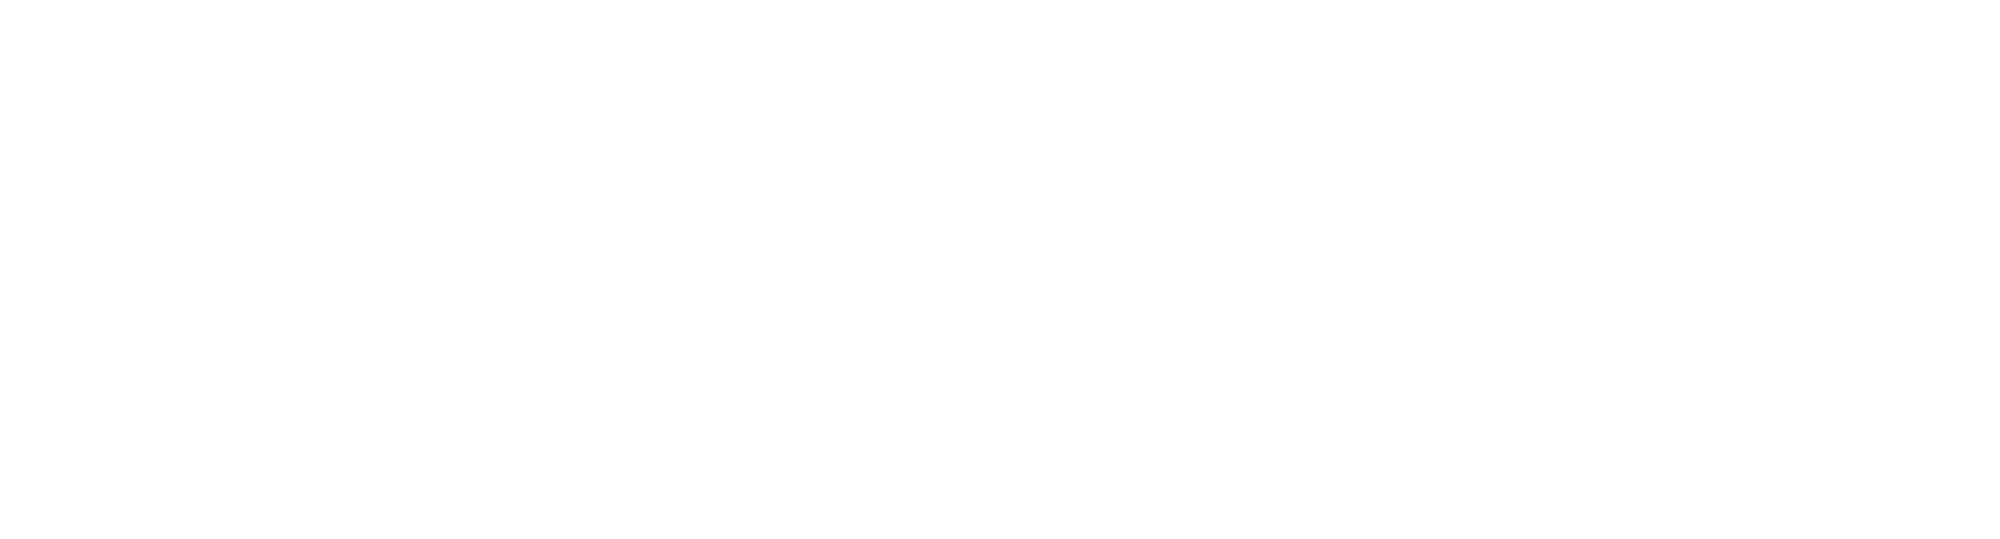 Bath bespoke Joinery Company